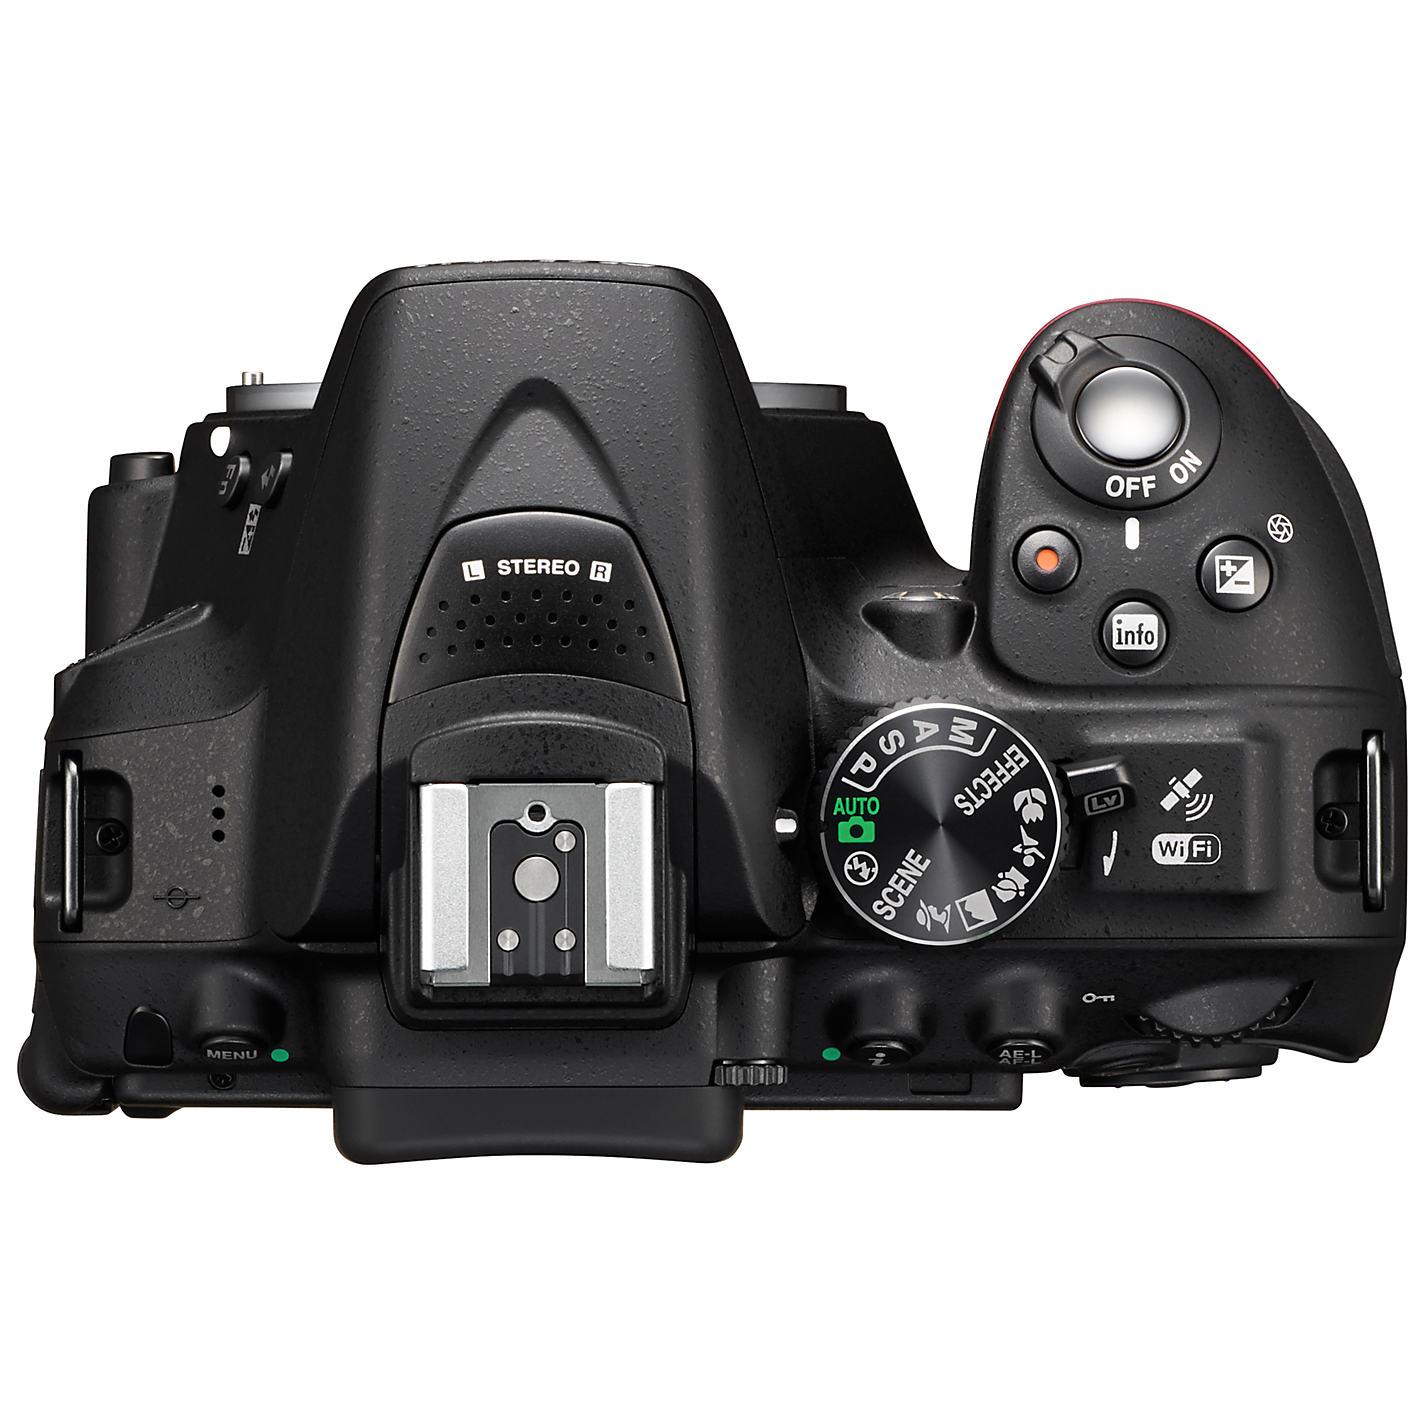 Nikon D5300 DSLR Camera (Body)